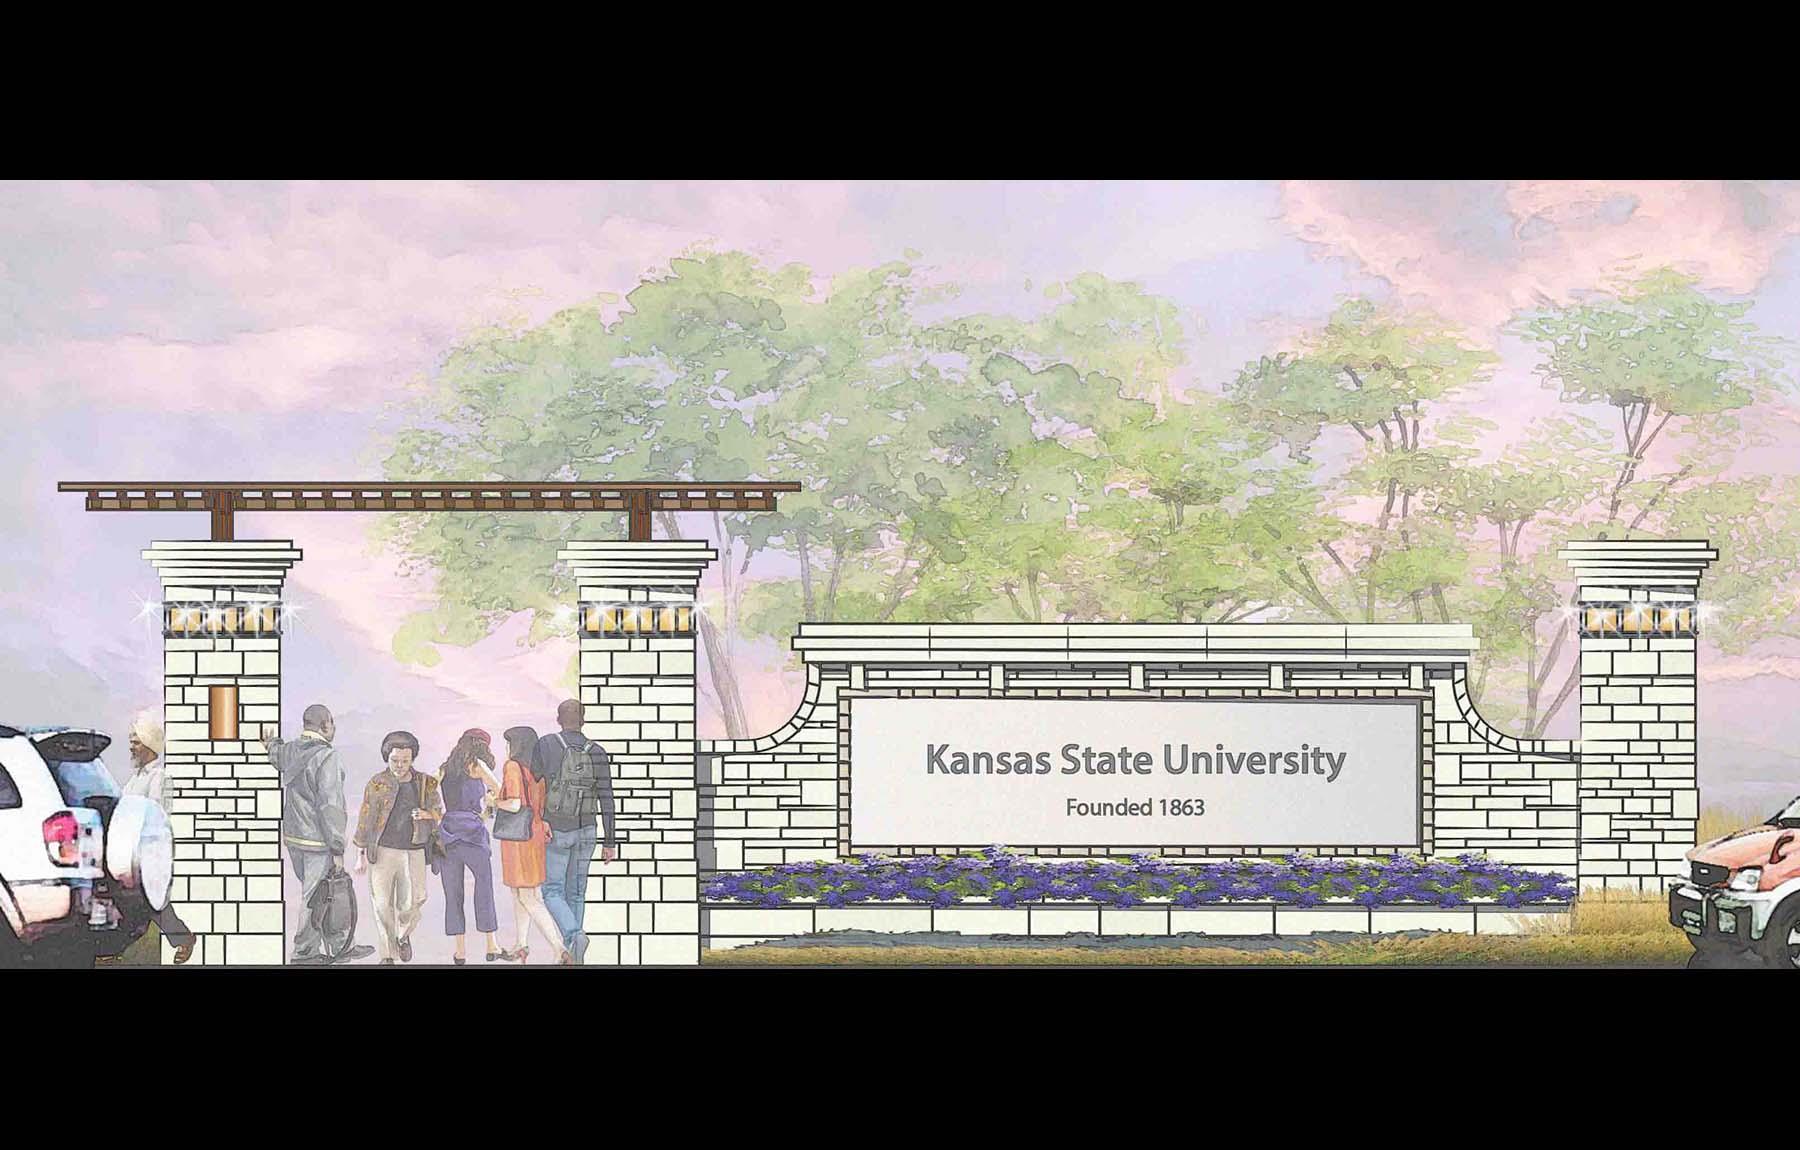 KSU Foundation to Develop a 14-Acre Site